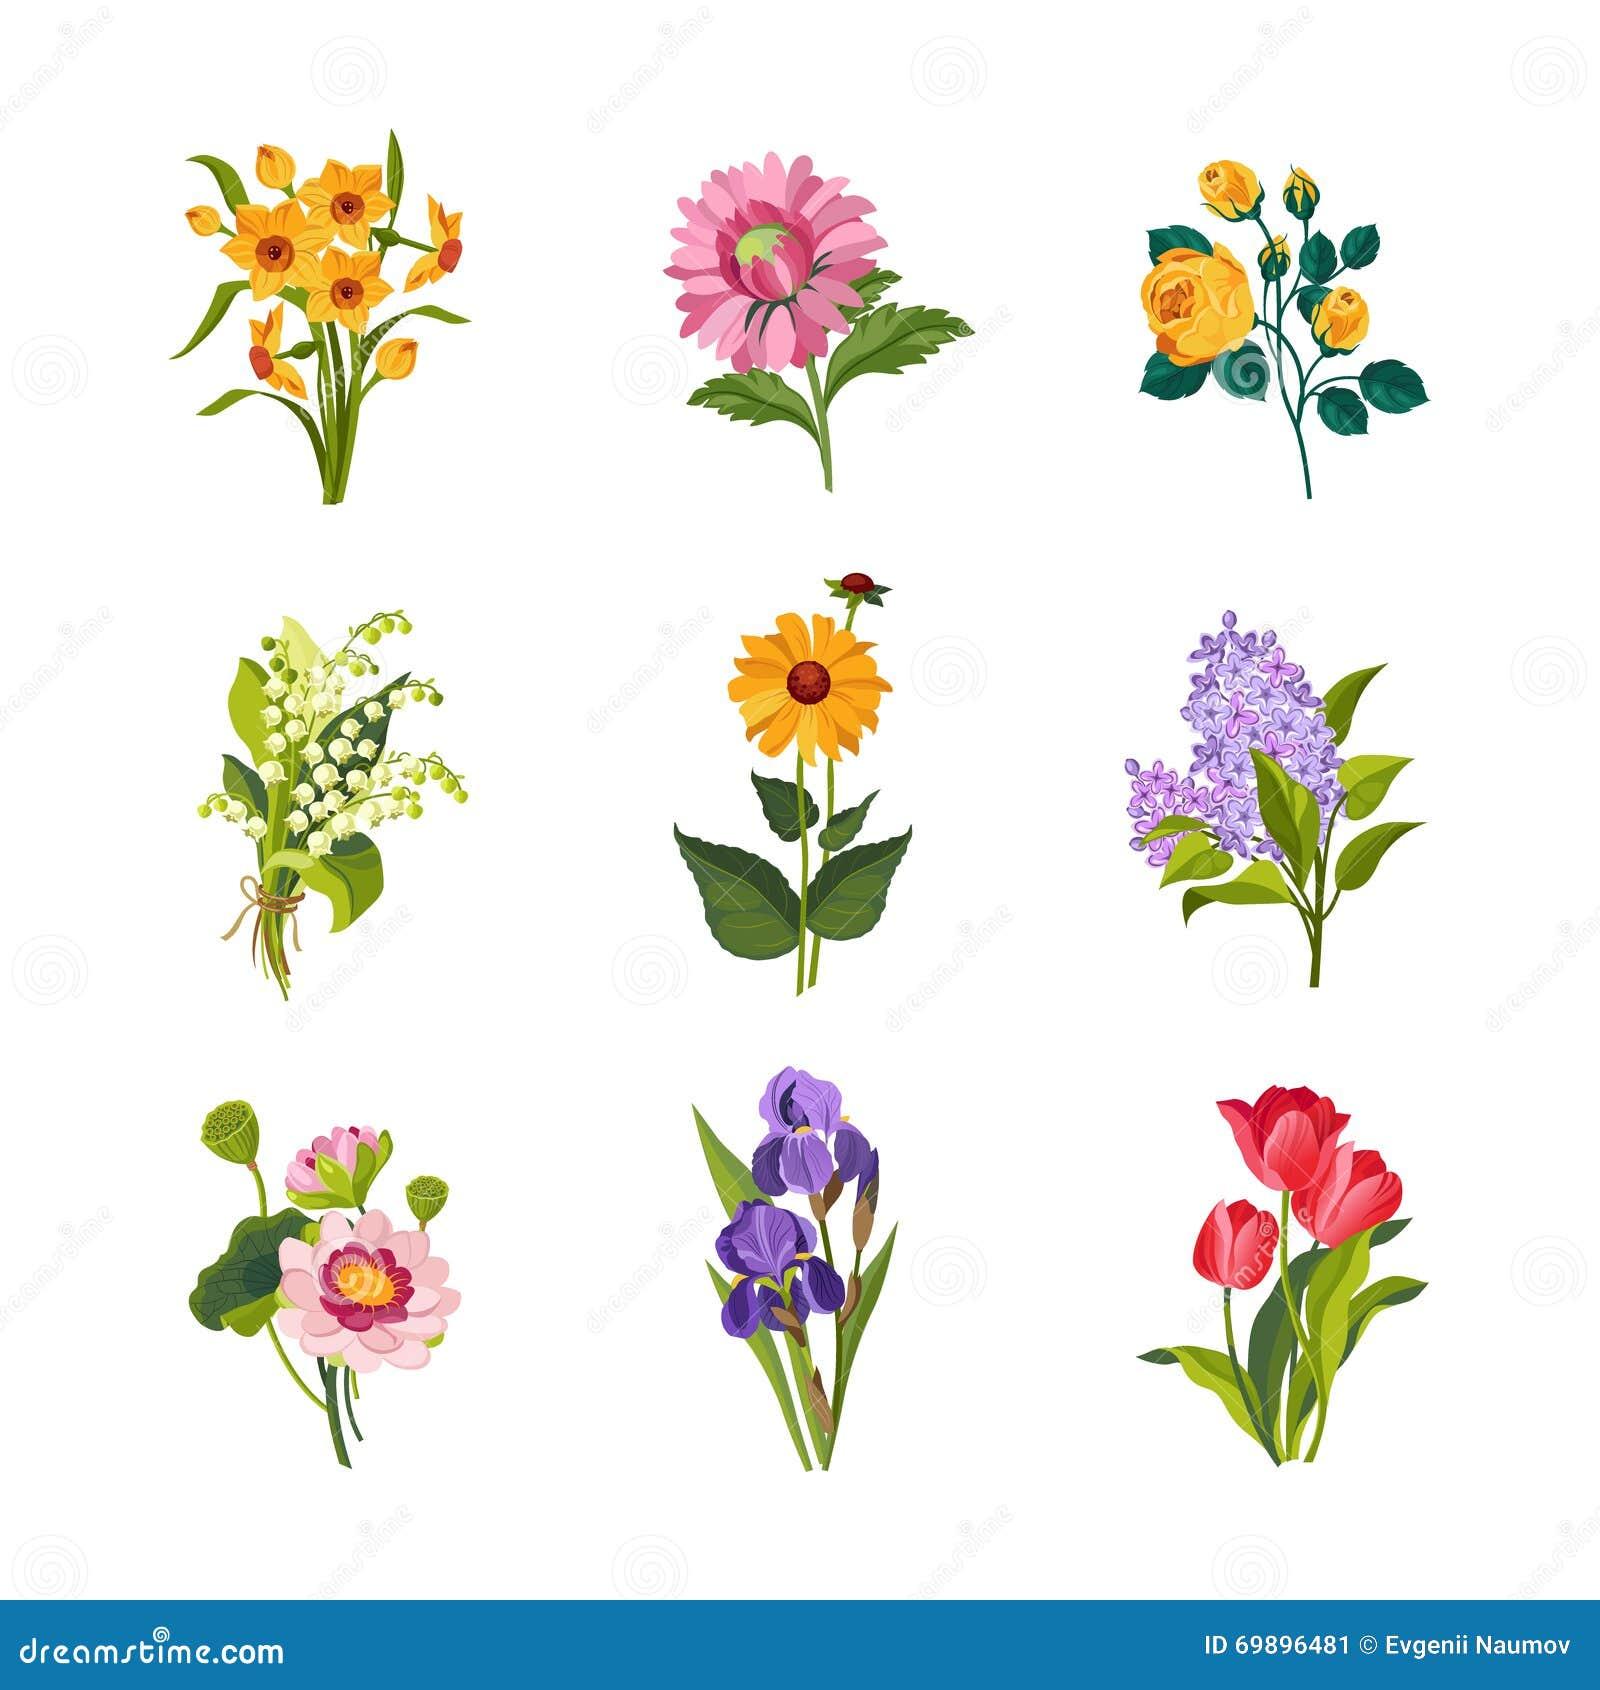 Garden Stock Image Image Of Design: Garden Flowers Collection Stock Vector